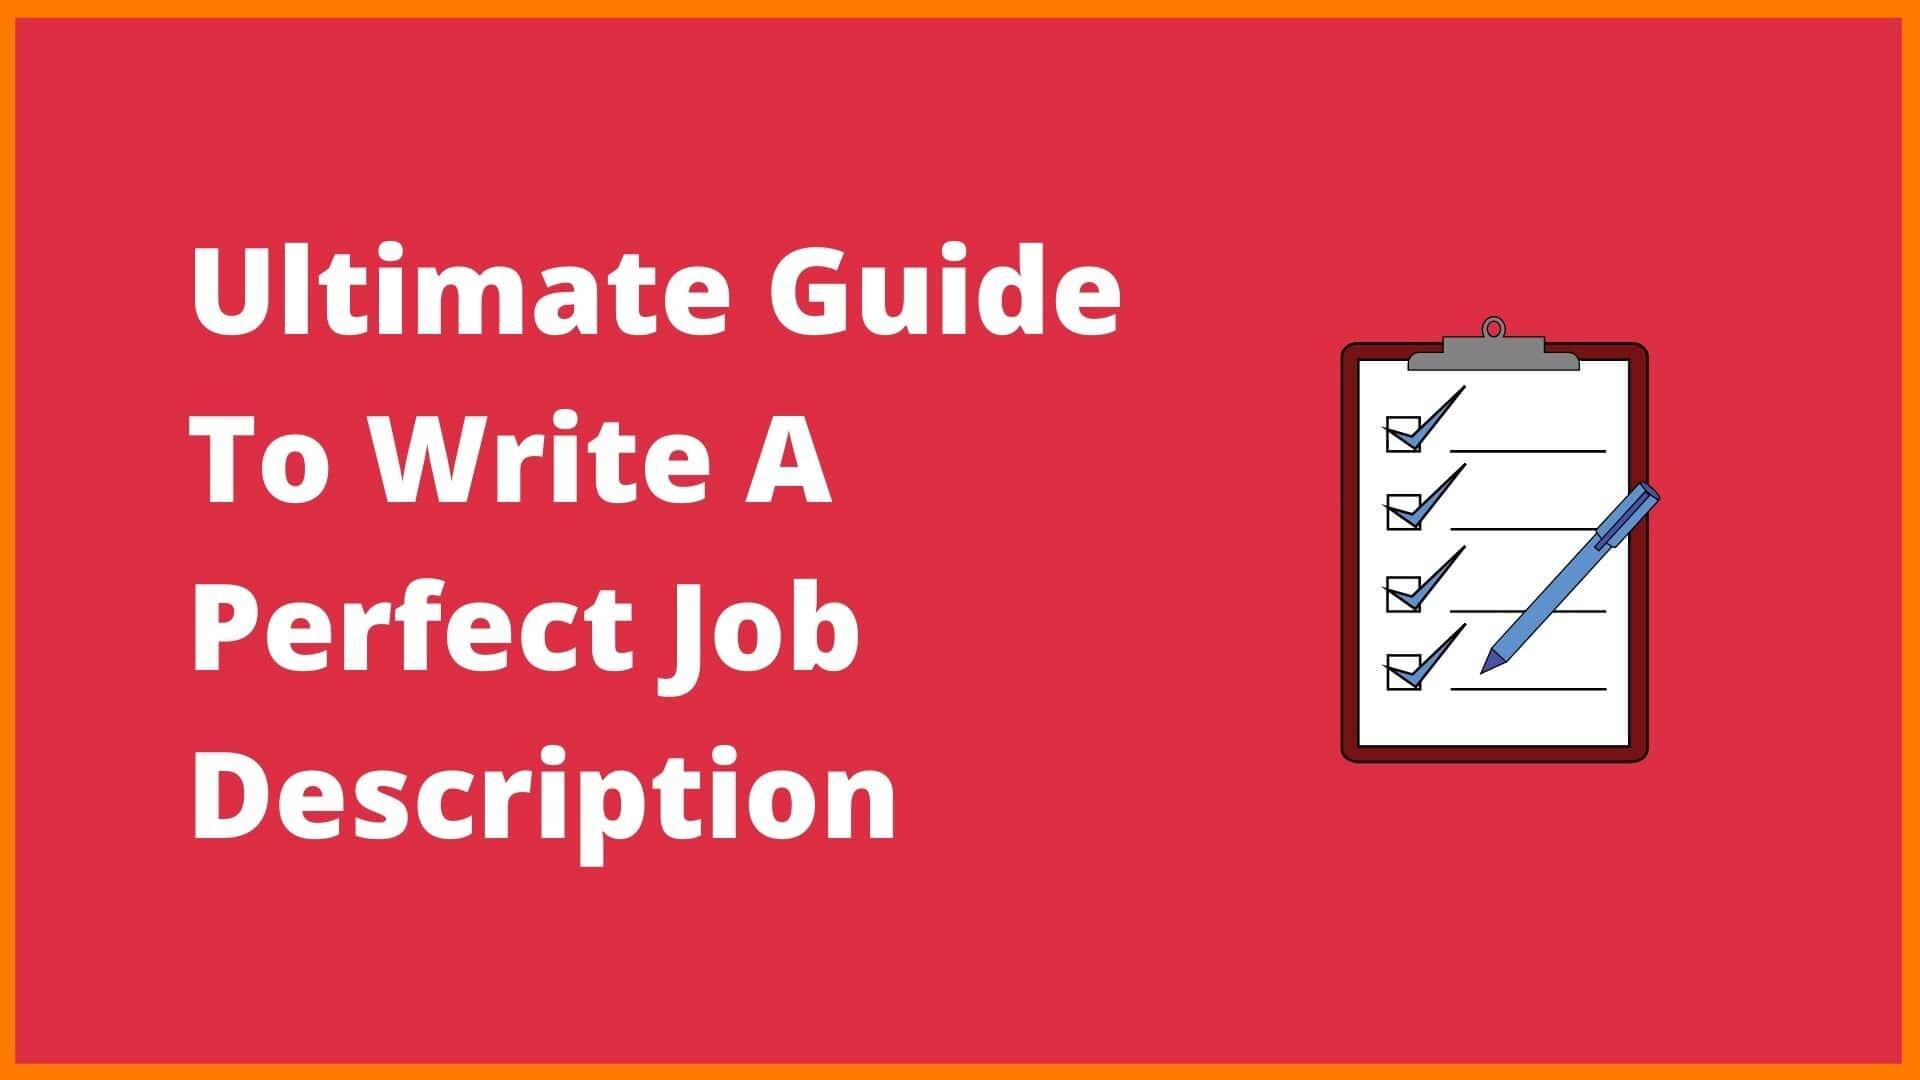 Ultimate Guide To Write A Perfect Job Description